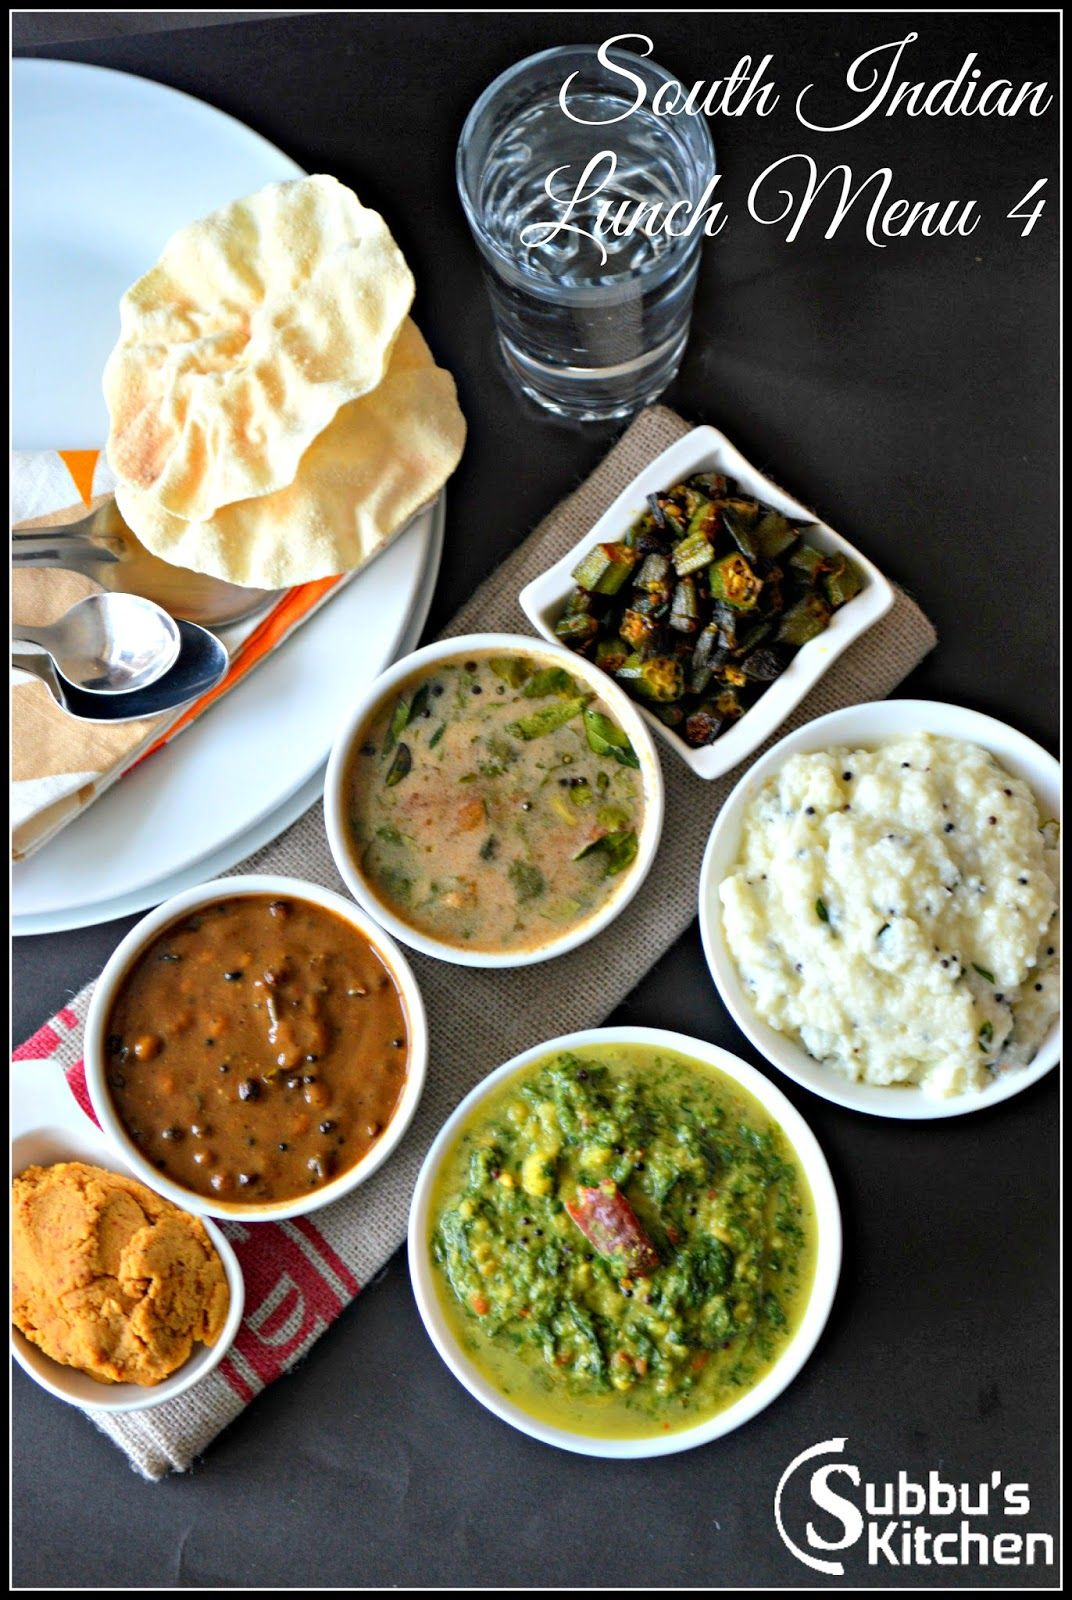 South Indian Lunch Menu 4 Vathakuzhambu, Araitha Rasam